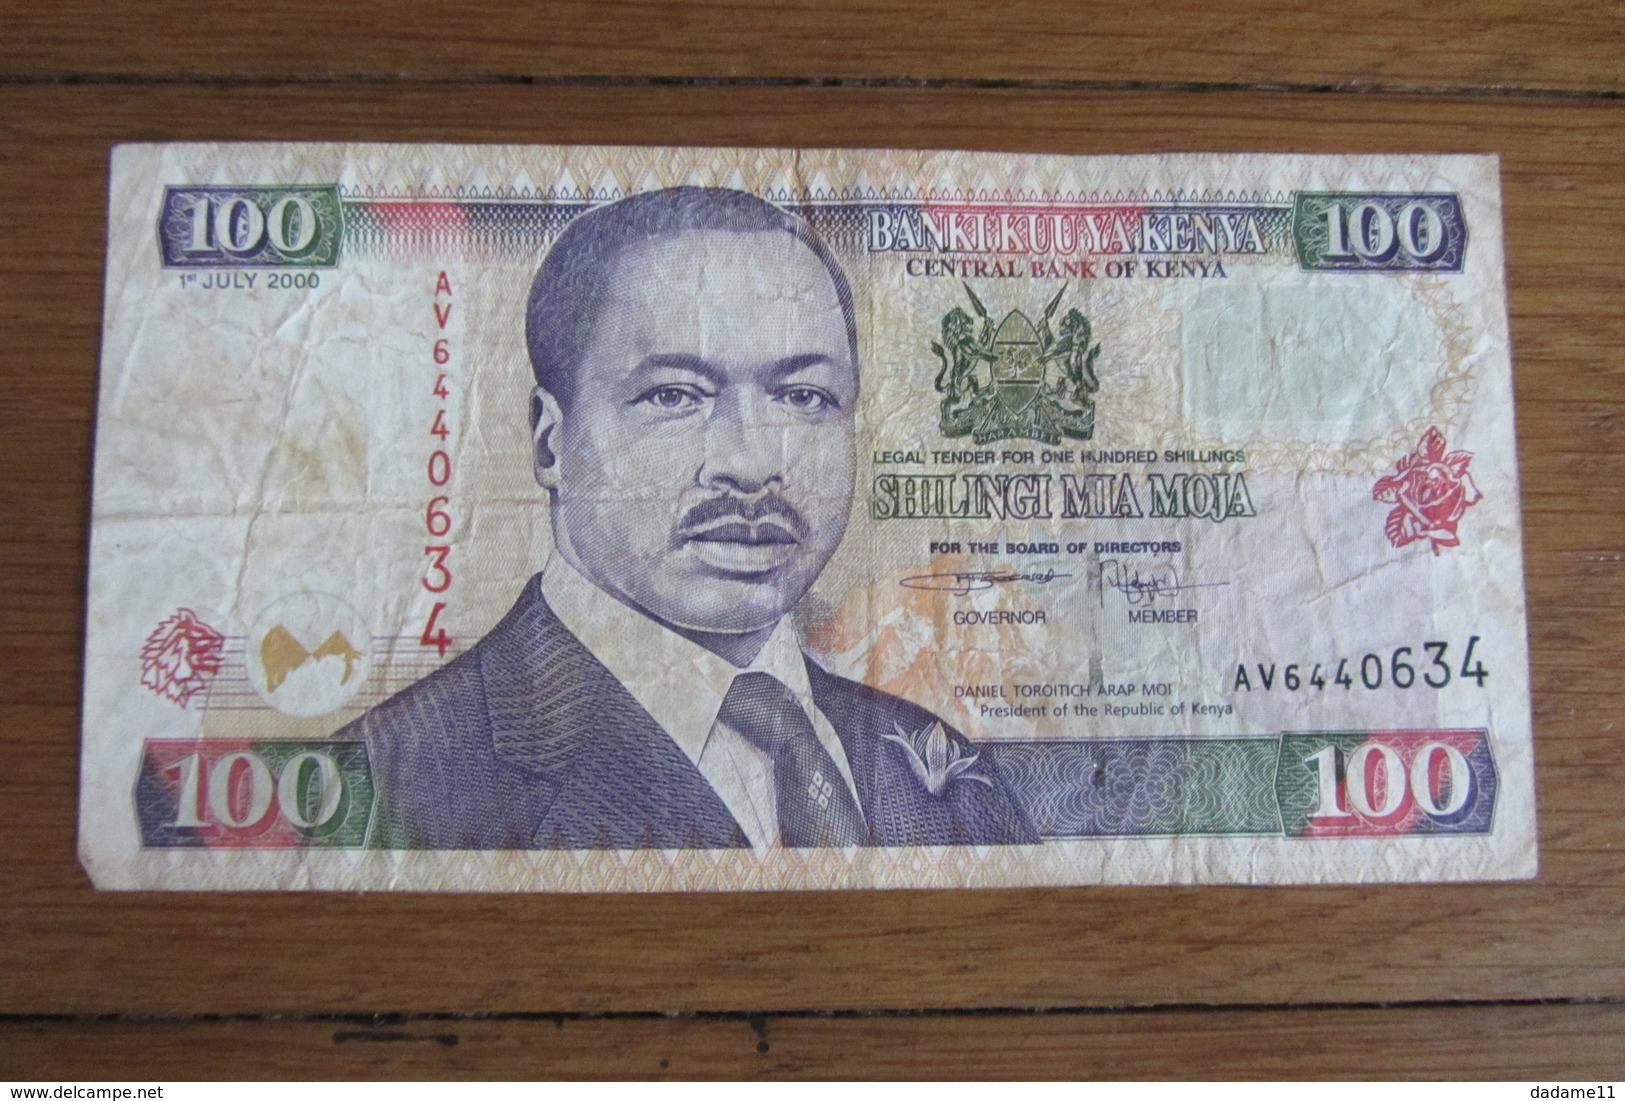 100 Shillingi Kenya - Kenya